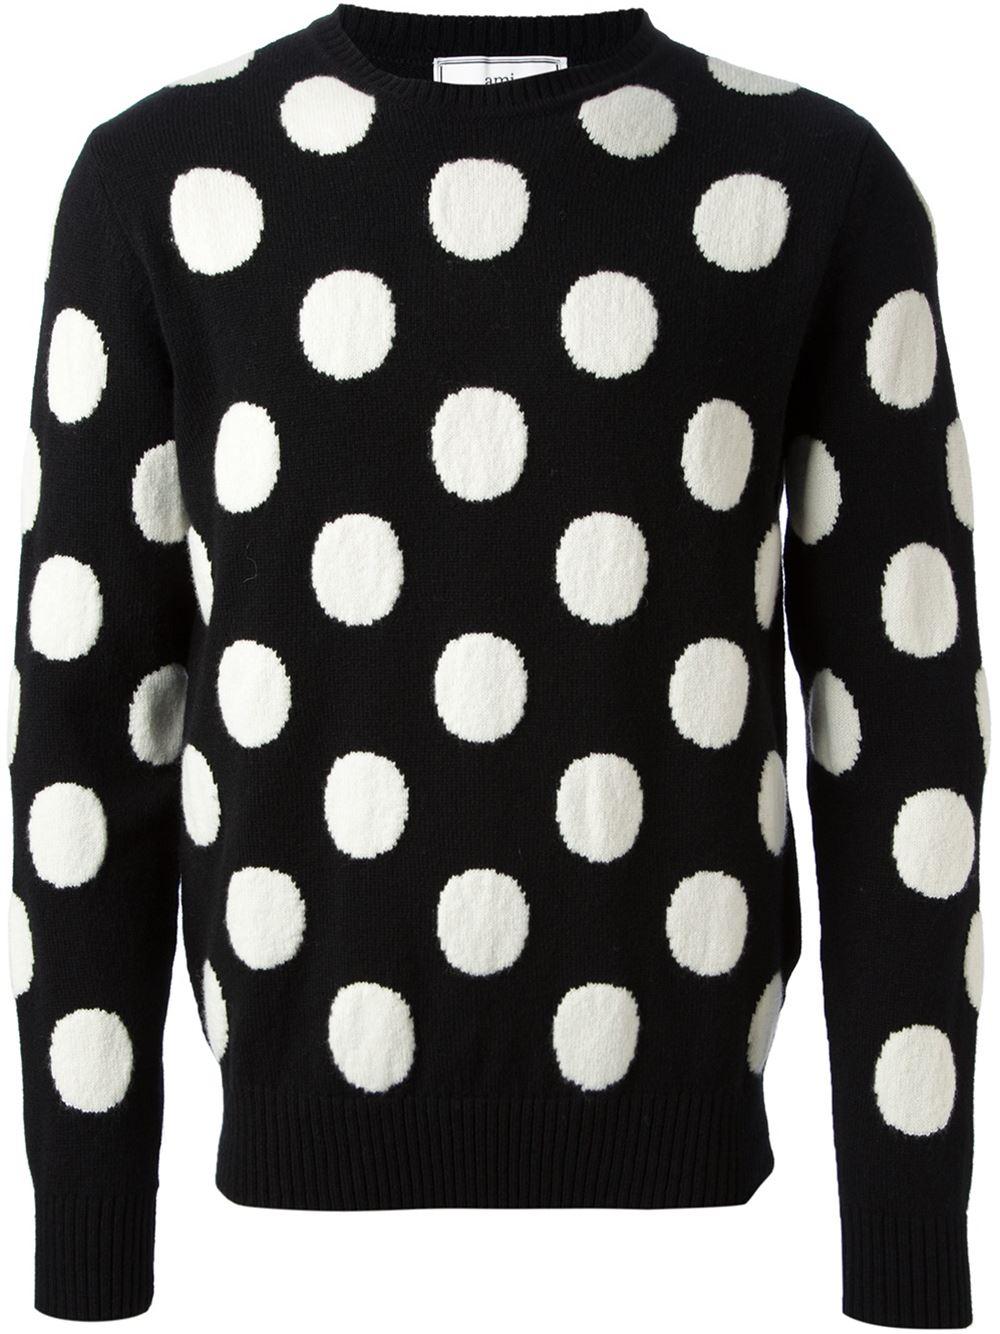 Lyst Ami Polka Dot Sweater In Black For Men